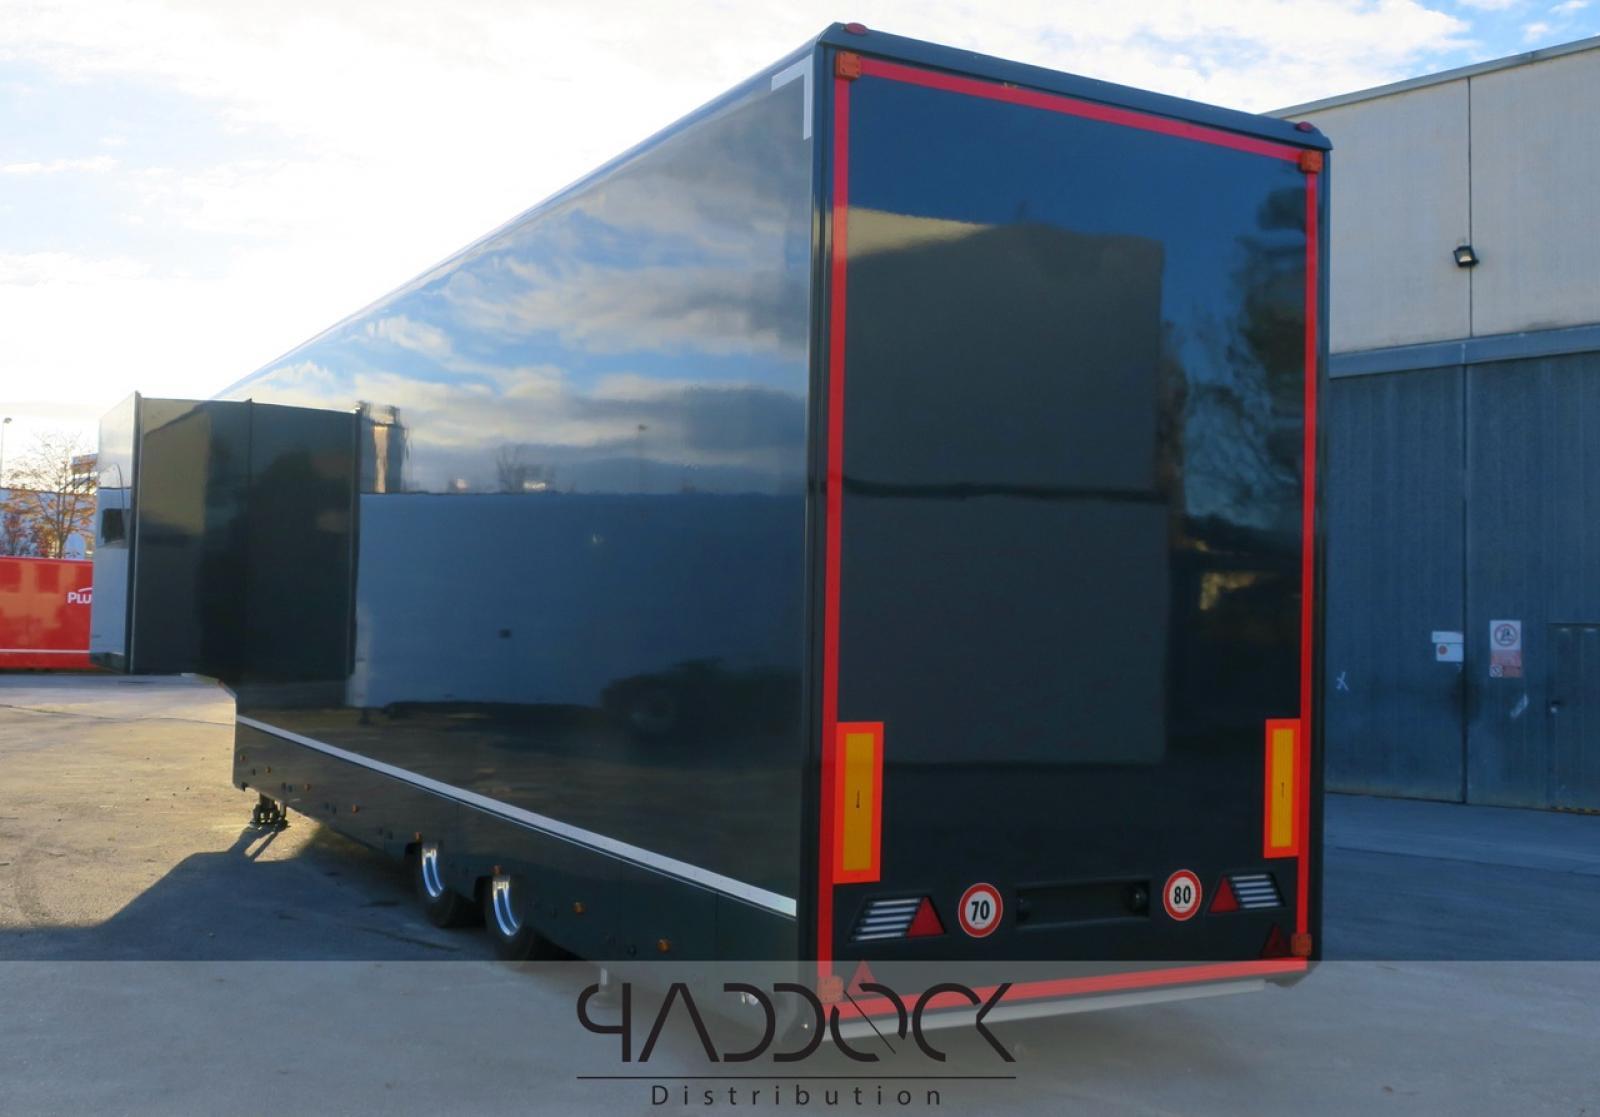 NEW 2020 ASTA CAR TRAILER BY PADDOCK DISTRIBUTION - 2